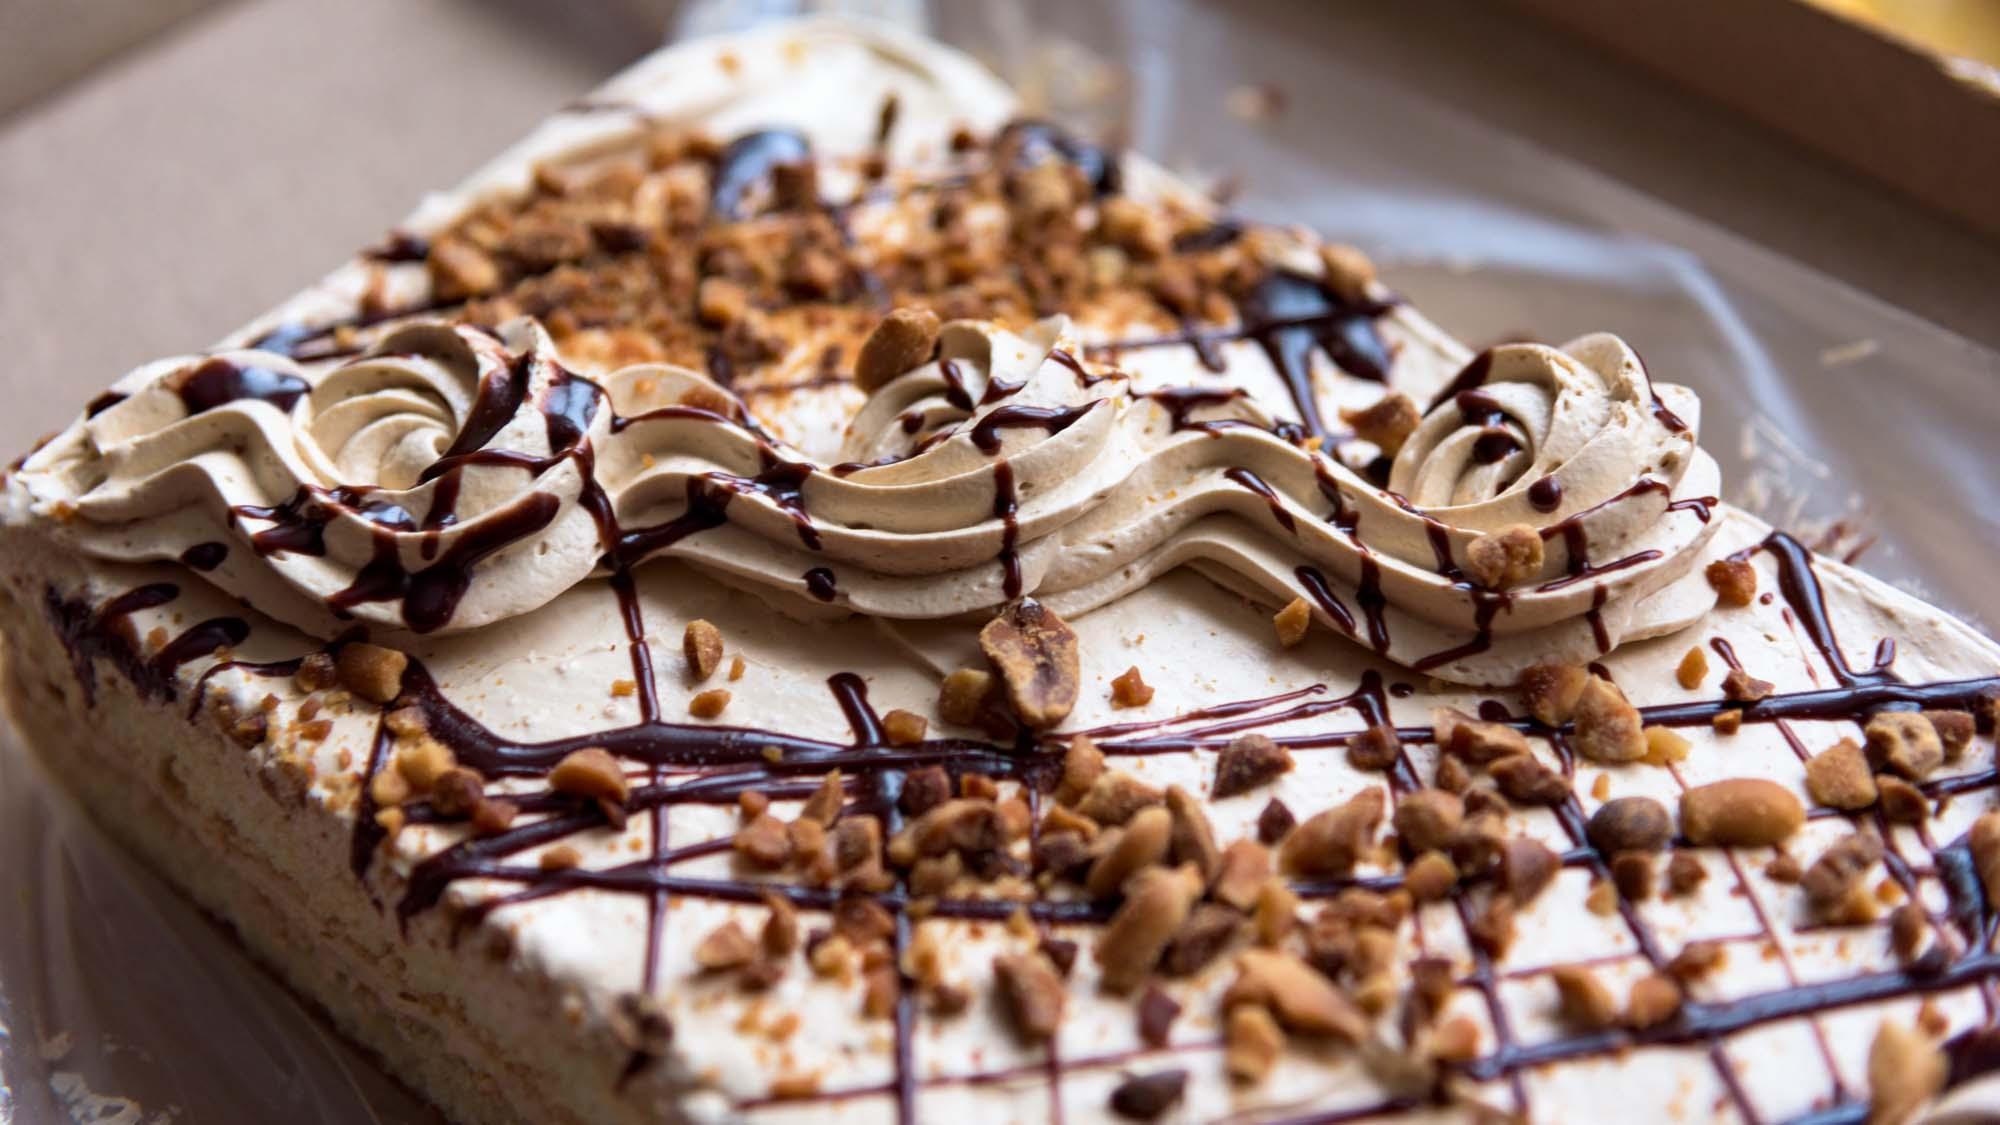 Bøge nøddekage med chokoladekræs